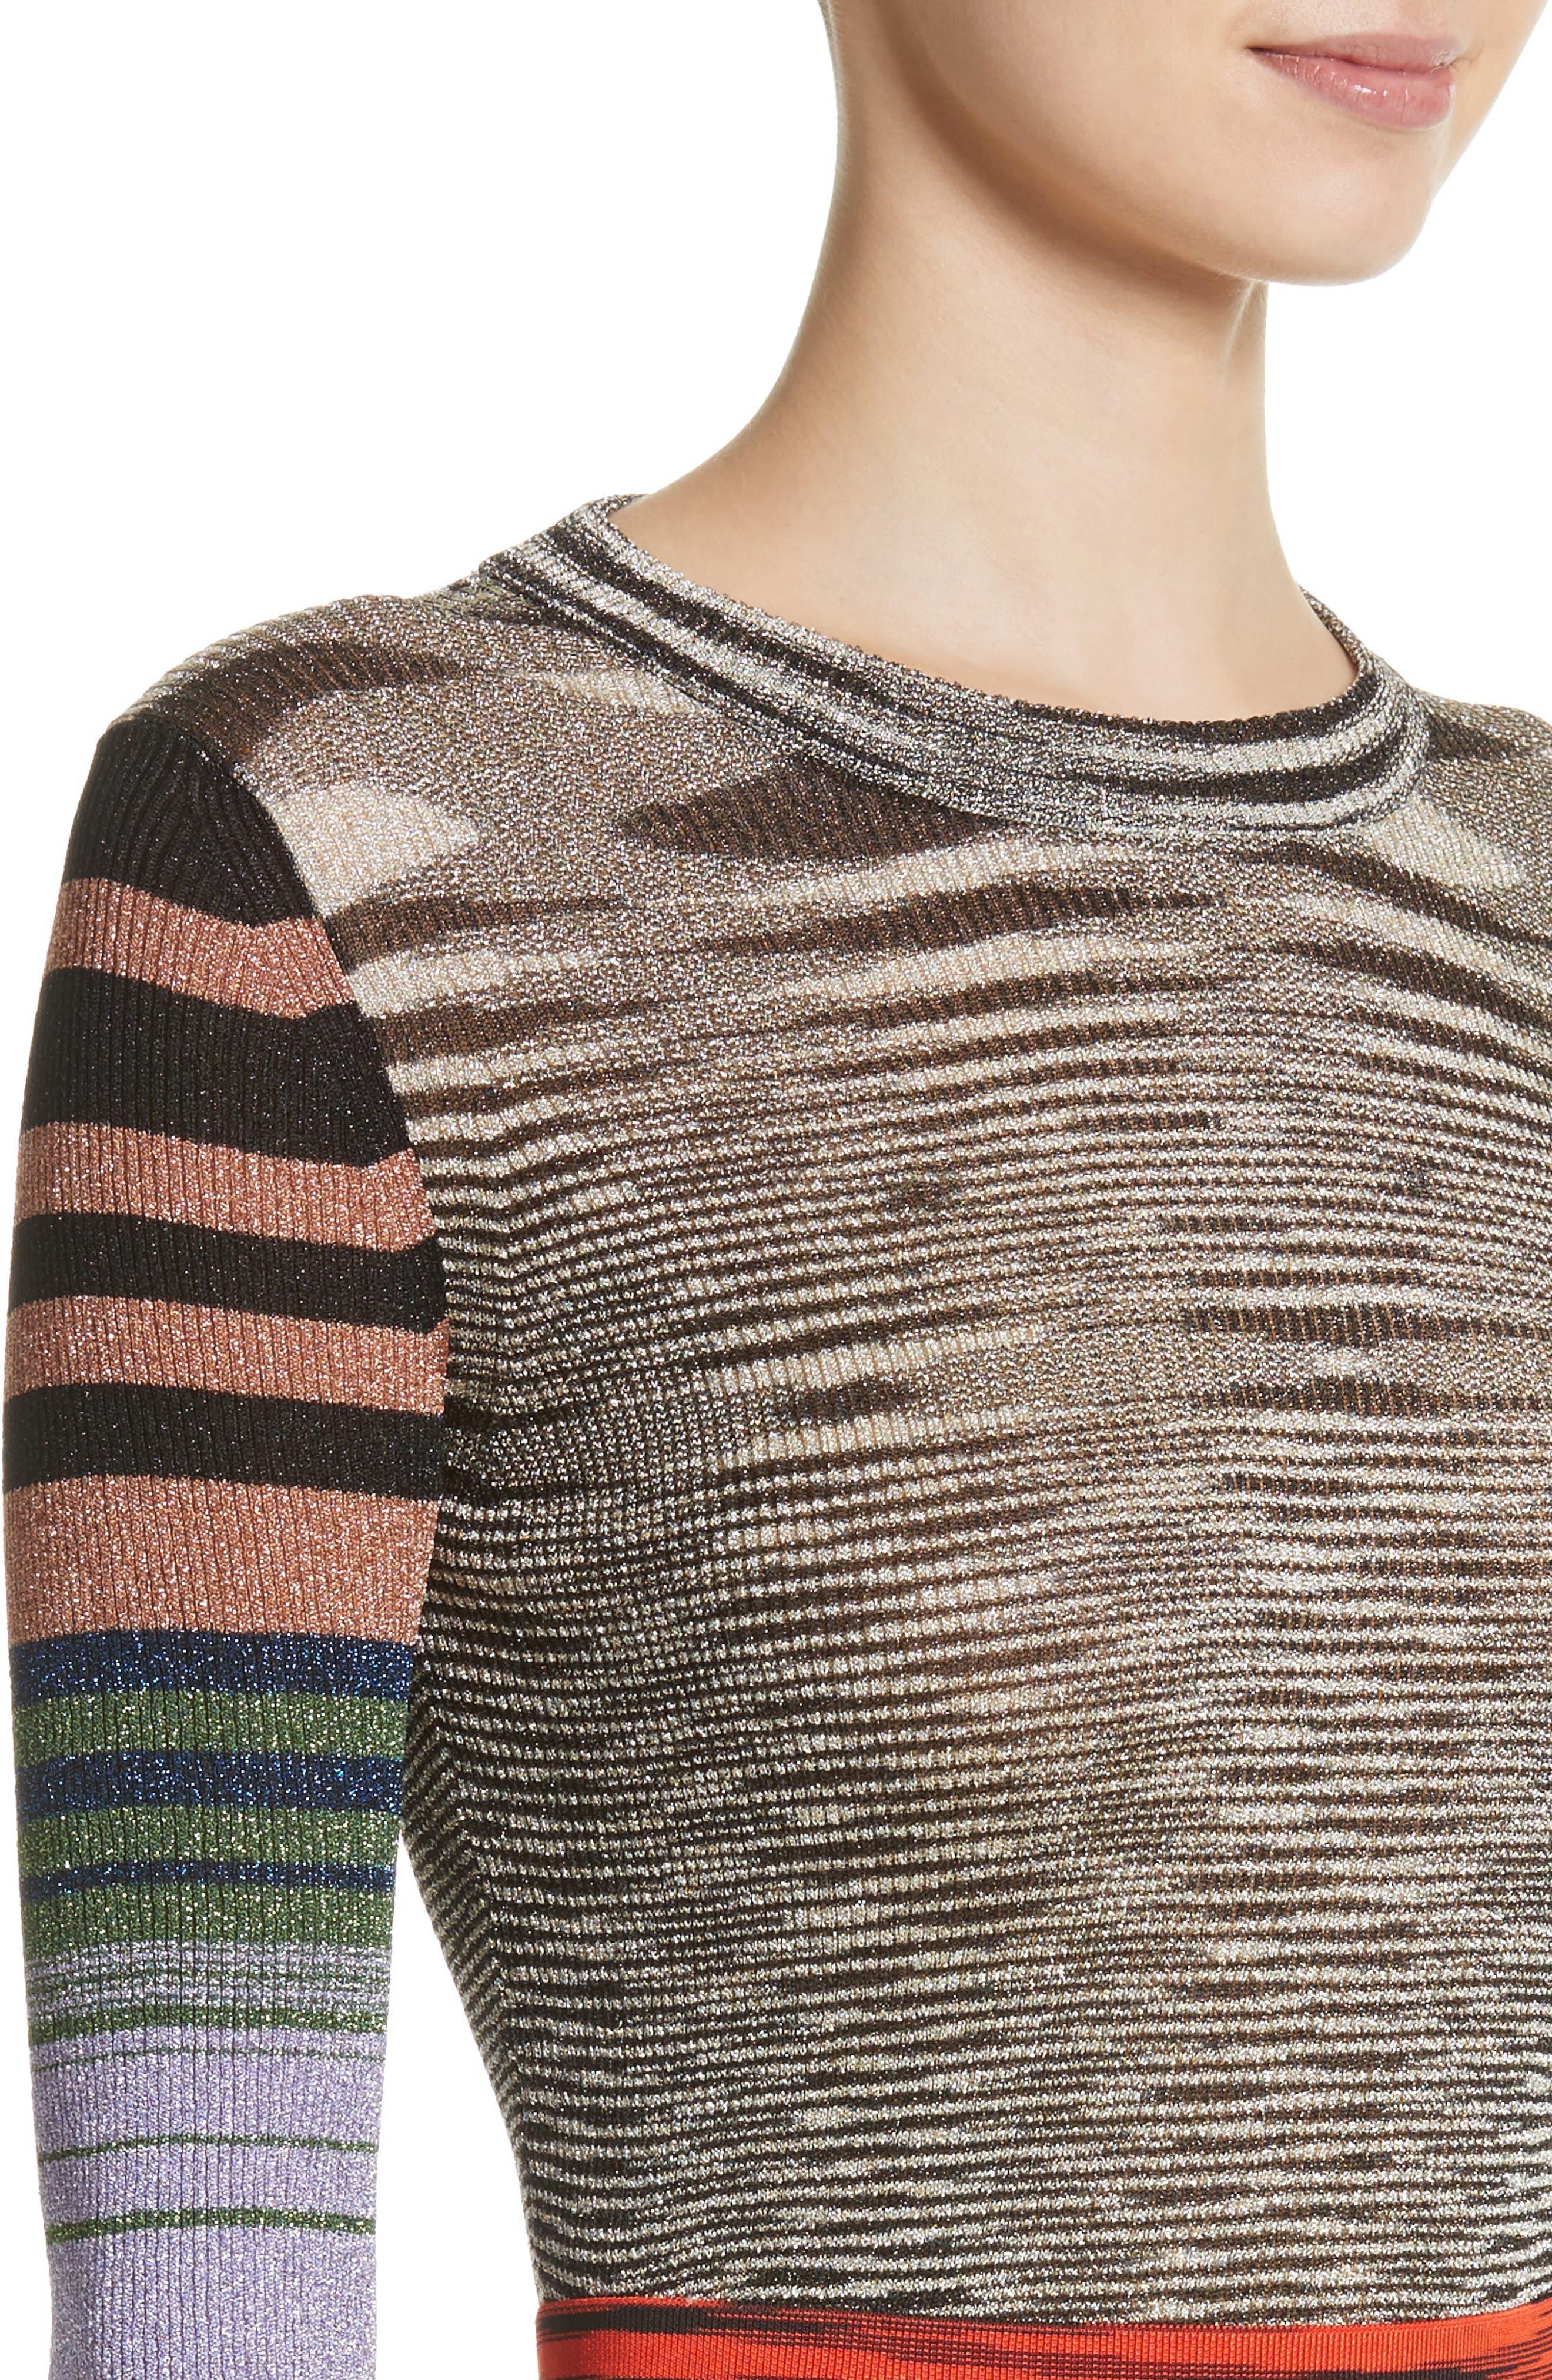 Metallic Space Dye Knit Sweater,                             Alternate thumbnail 4, color,                             Multi